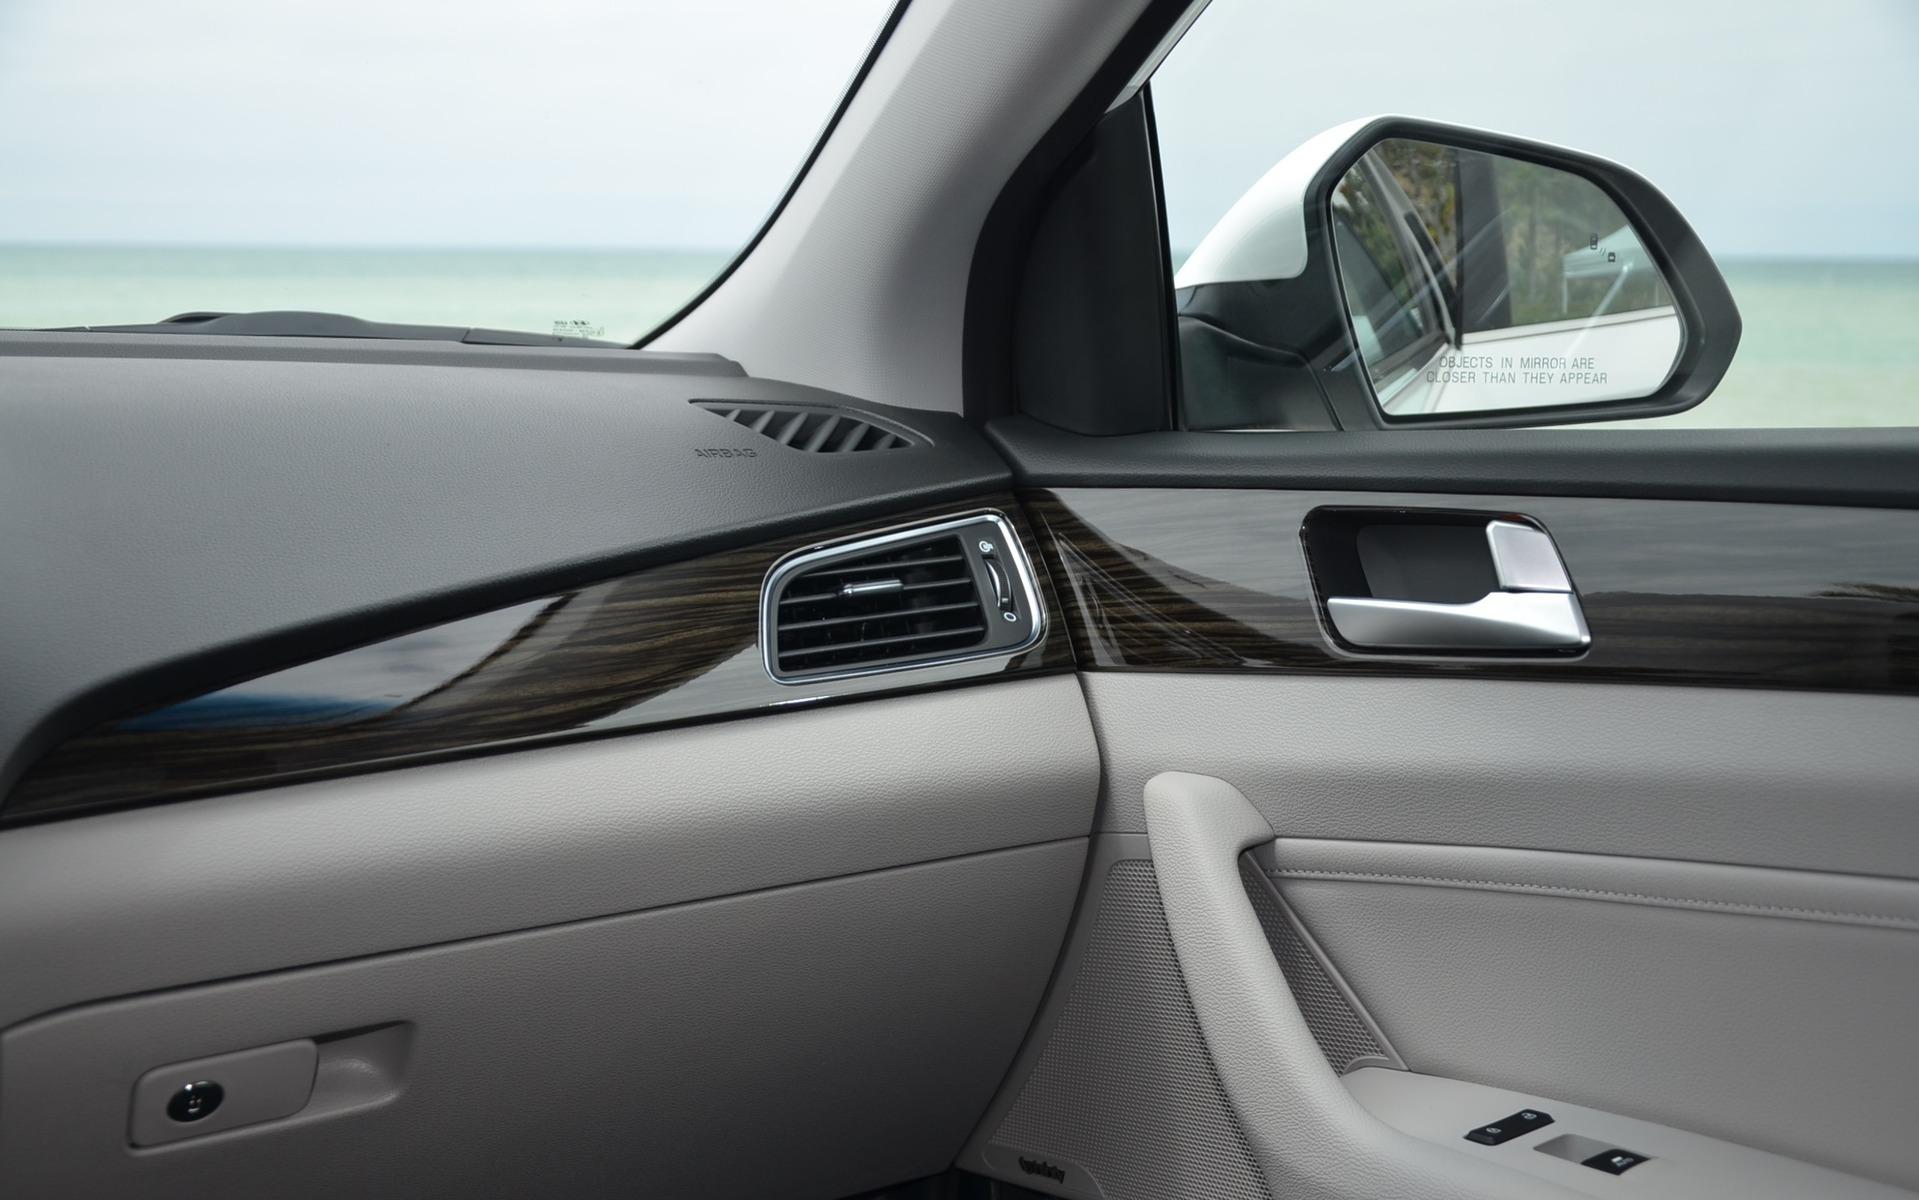 Hyundai Sonata Hybride branchable  2016 - Détail de la planche de bord